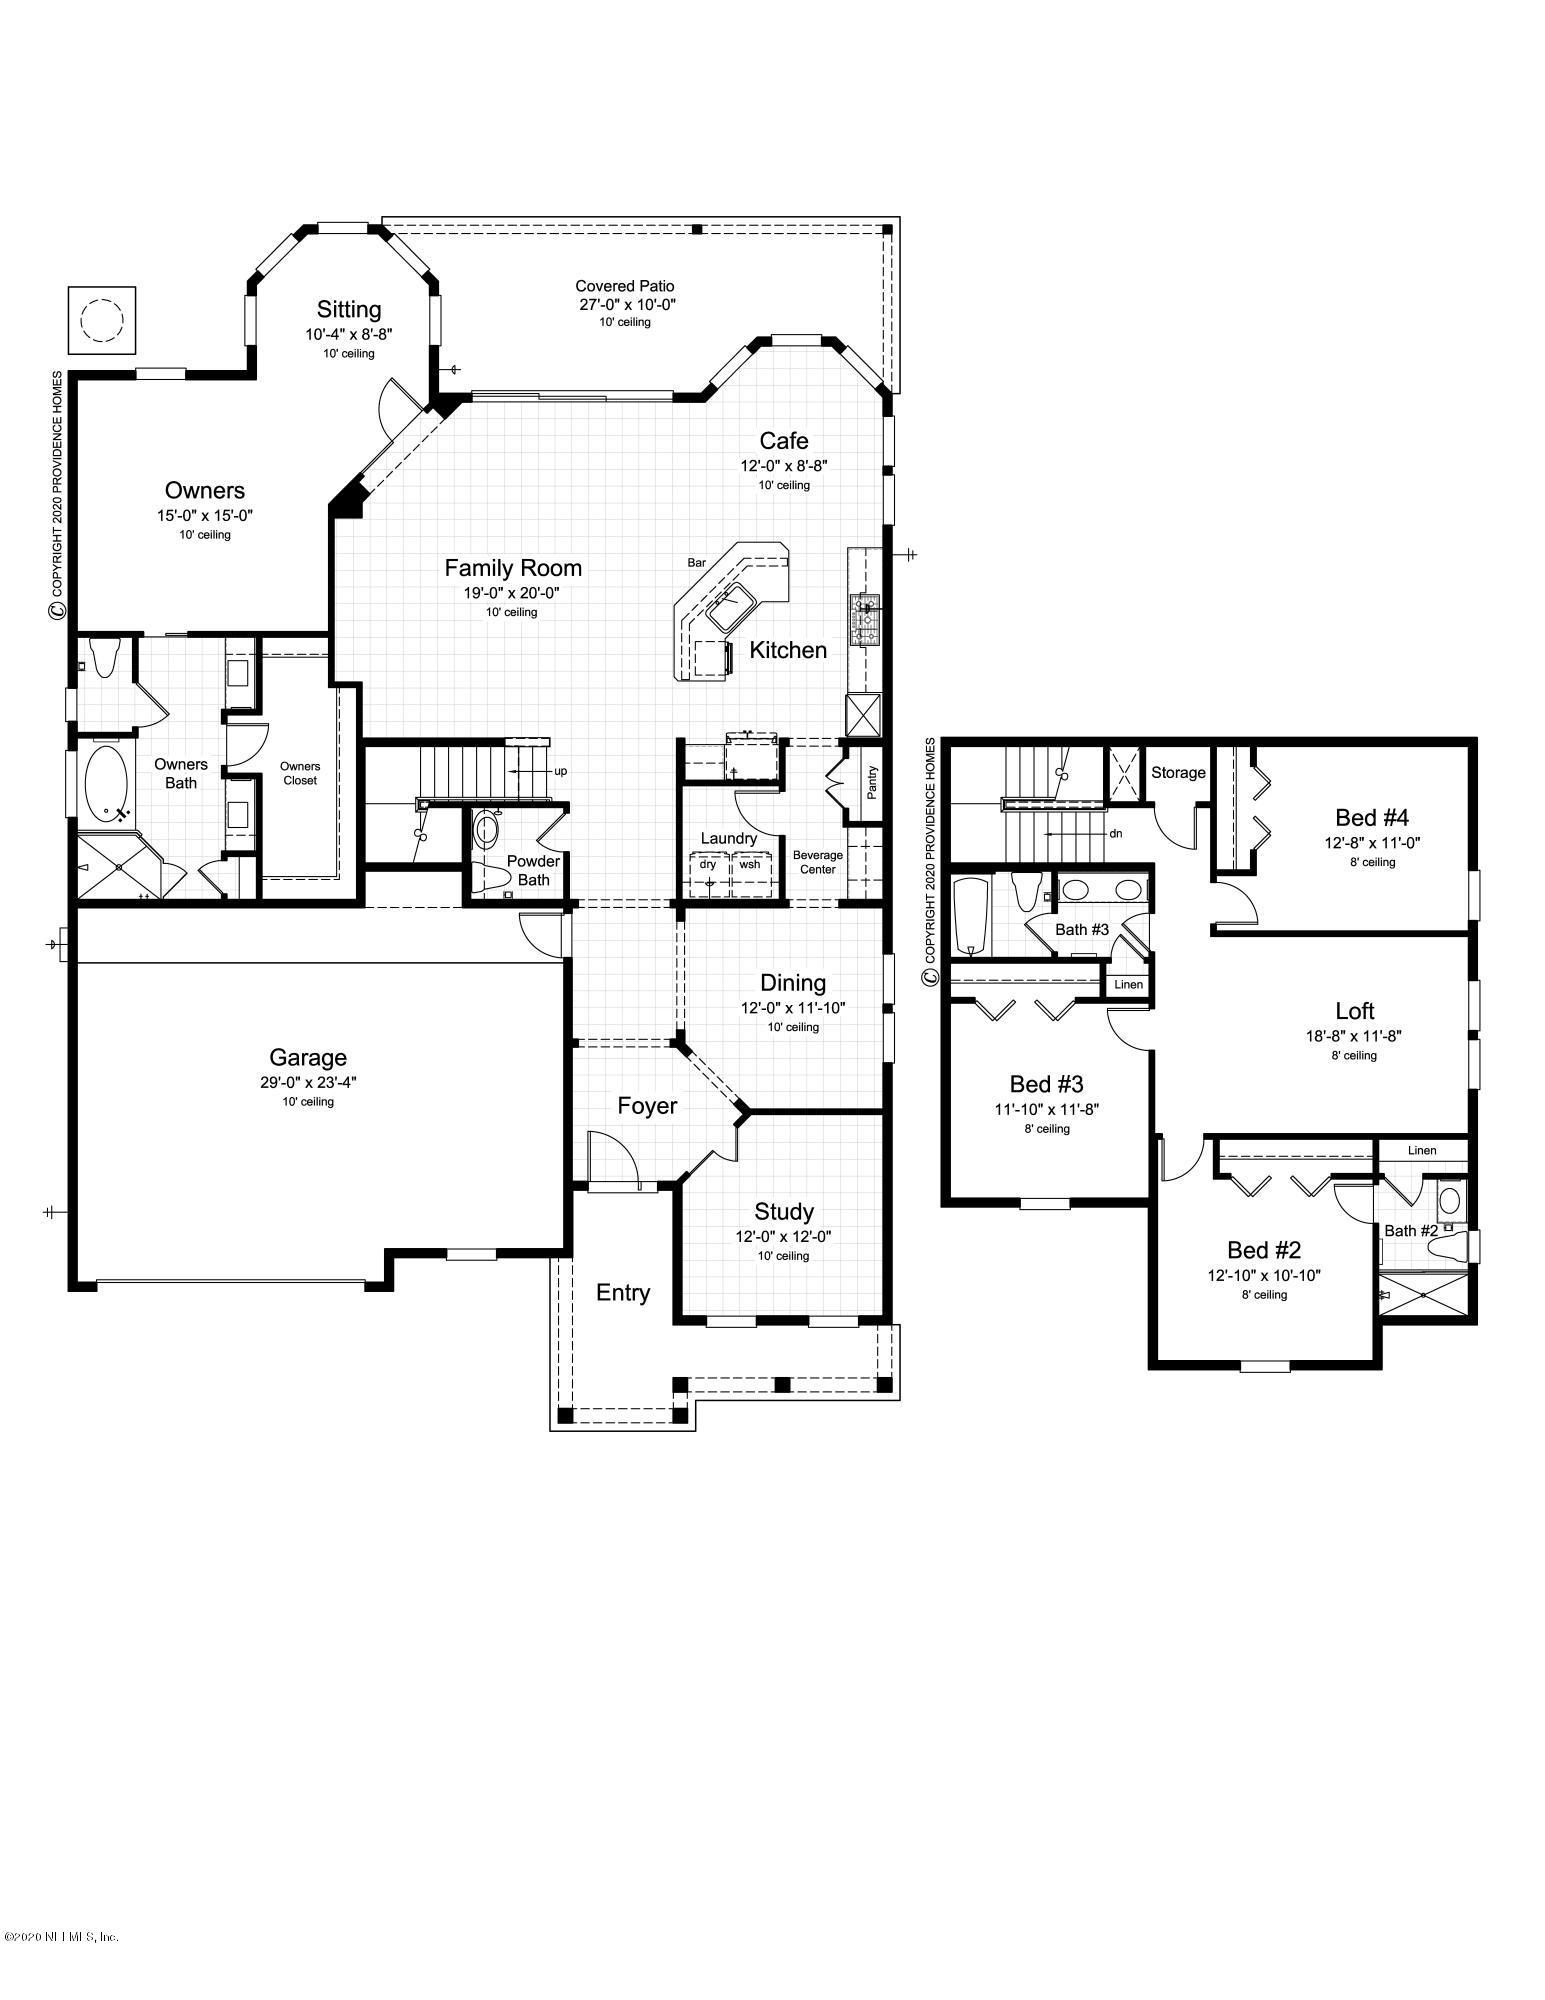 89 FREEDOM LANDING, PONTE VEDRA, FLORIDA 32081, 4 Bedrooms Bedrooms, ,3 BathroomsBathrooms,Residential,For sale,FREEDOM LANDING,1056681